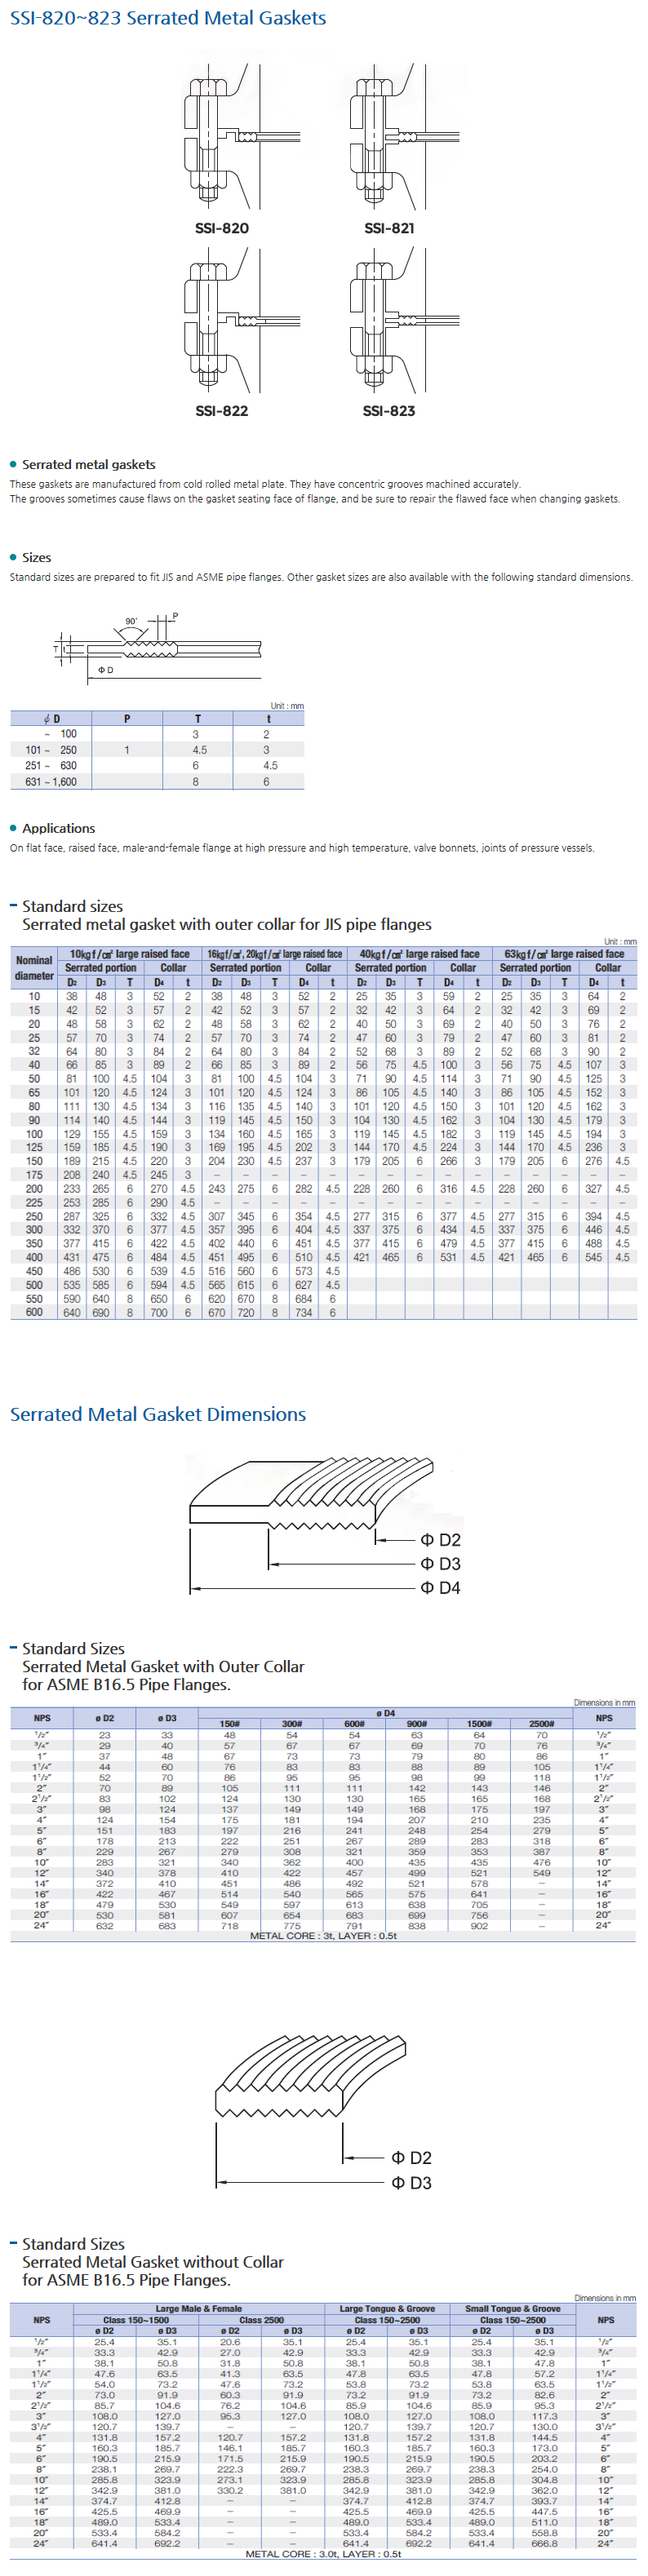 Samsung Industry Serrated Metal Gasket SSI-820/821/822/823